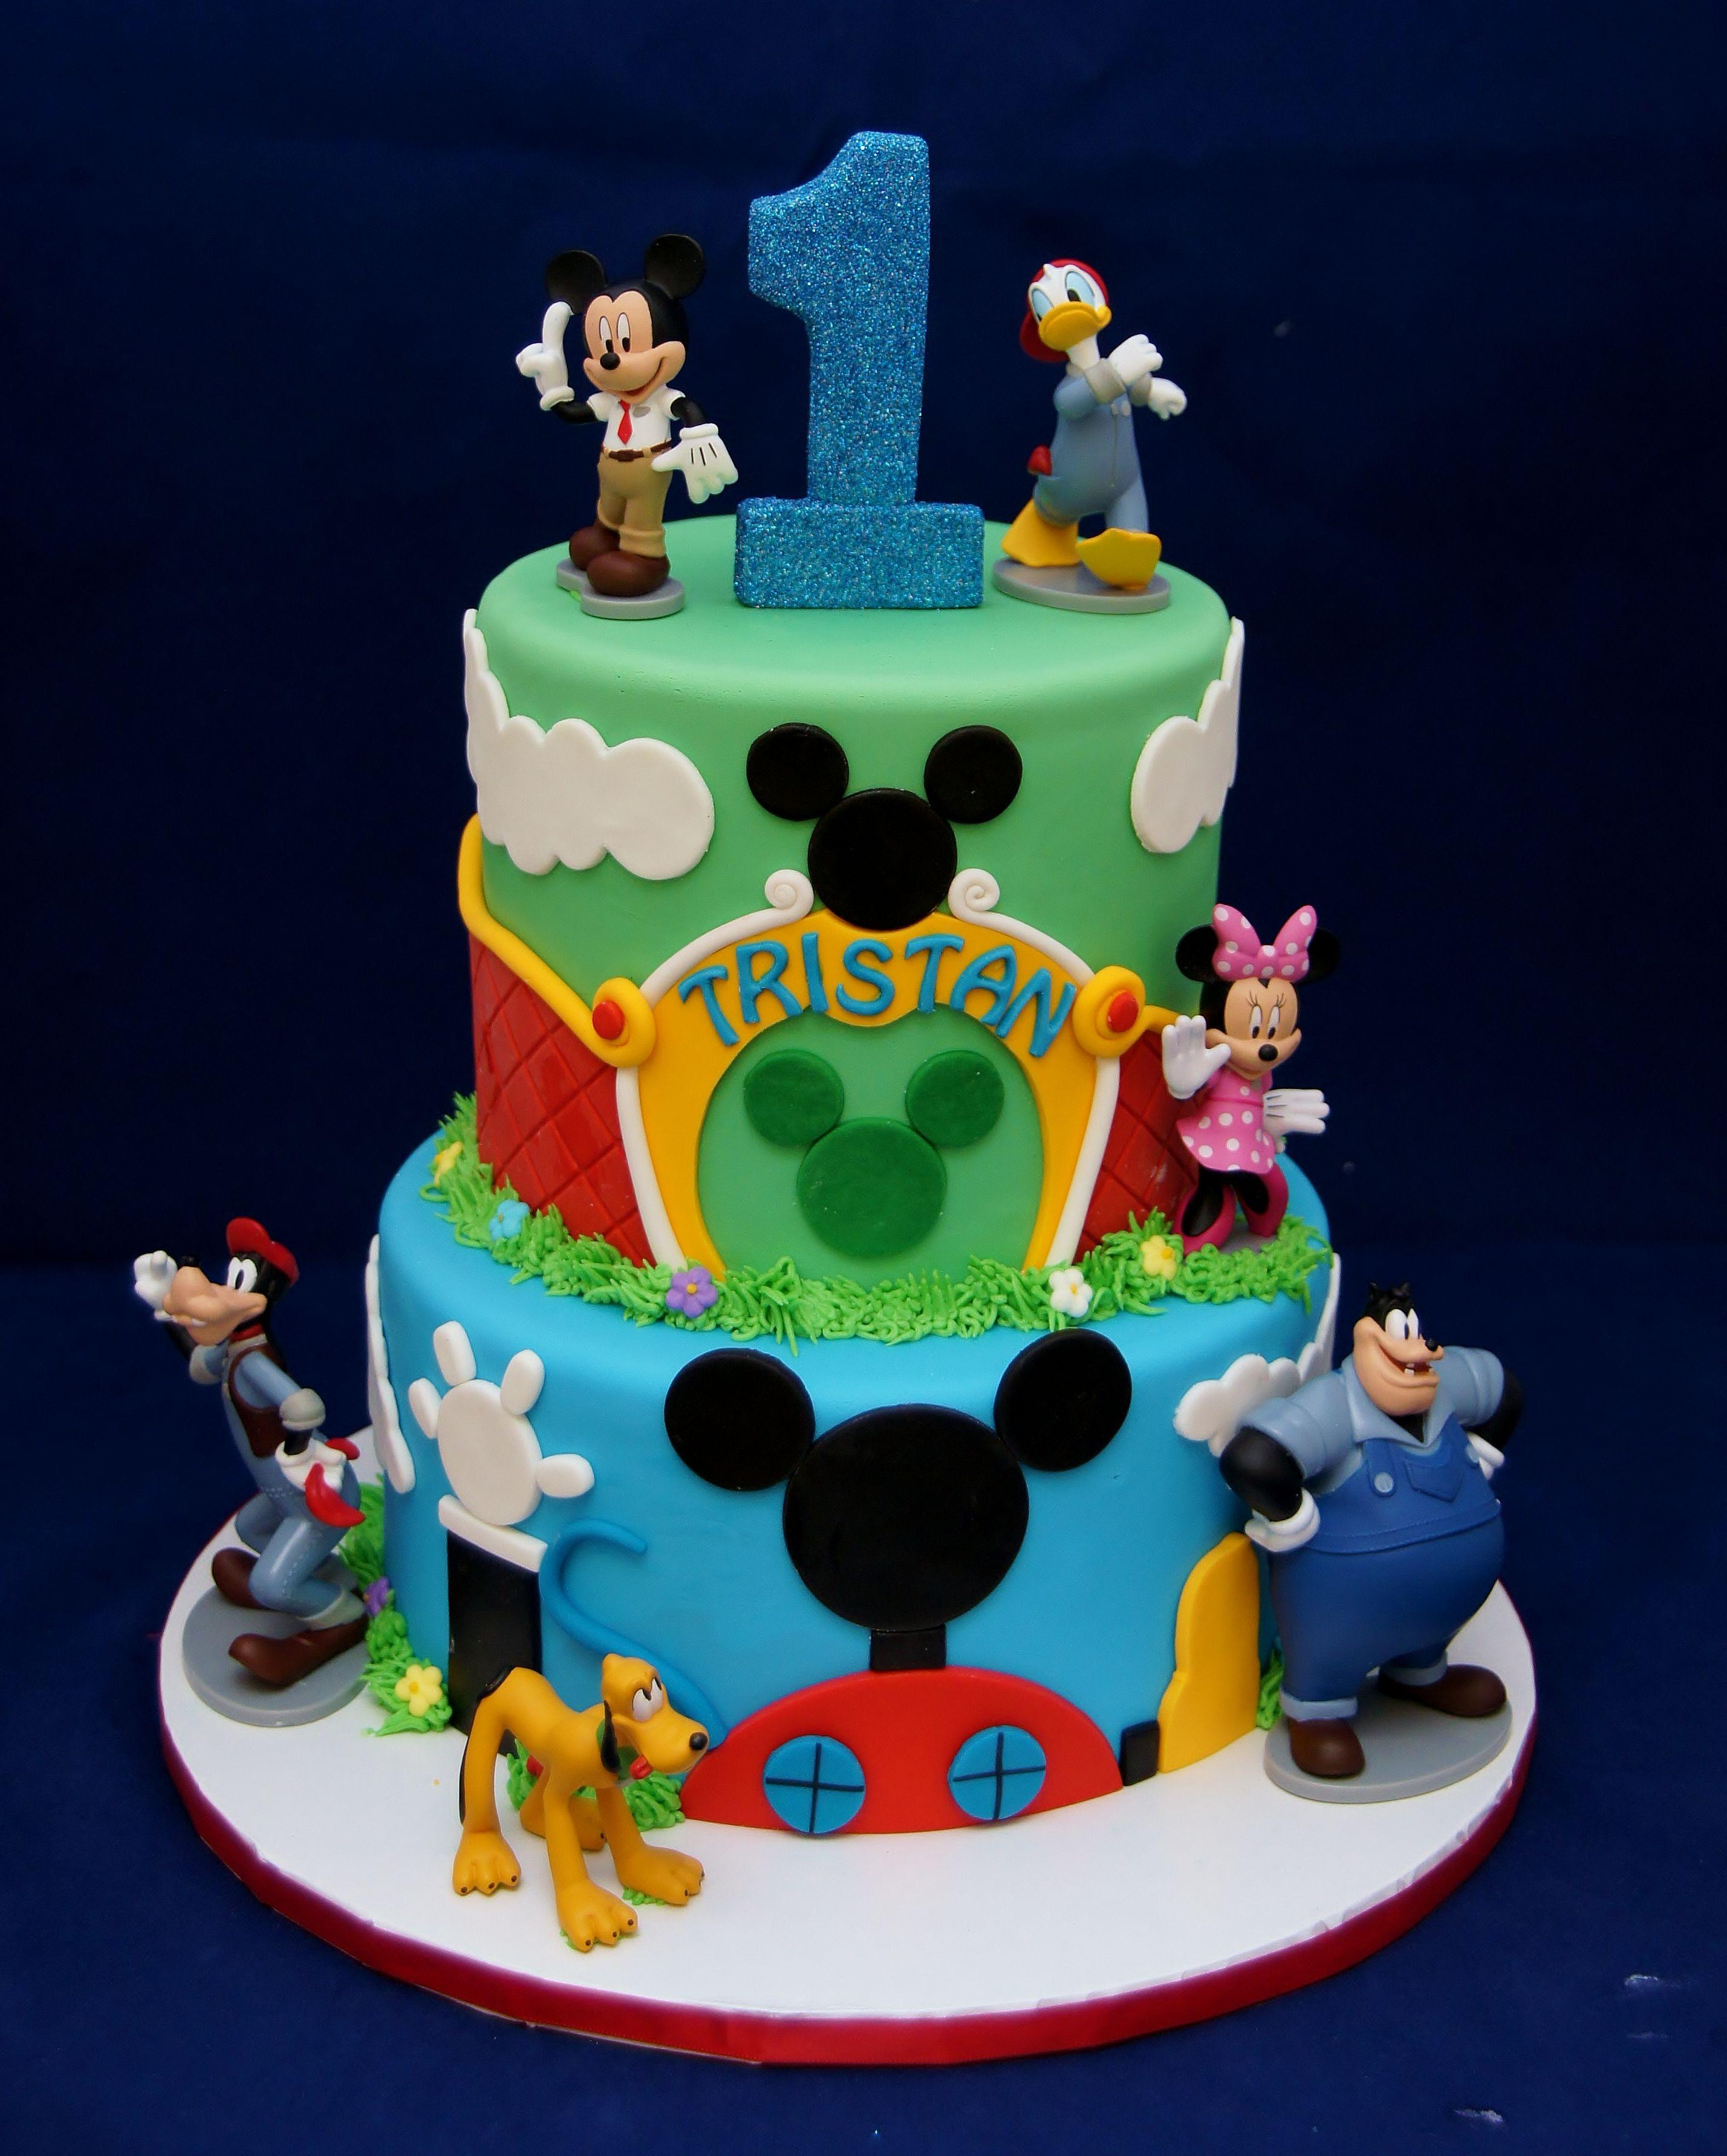 Mickey Mouse Club & Mickey Park themed cake 1st birthday